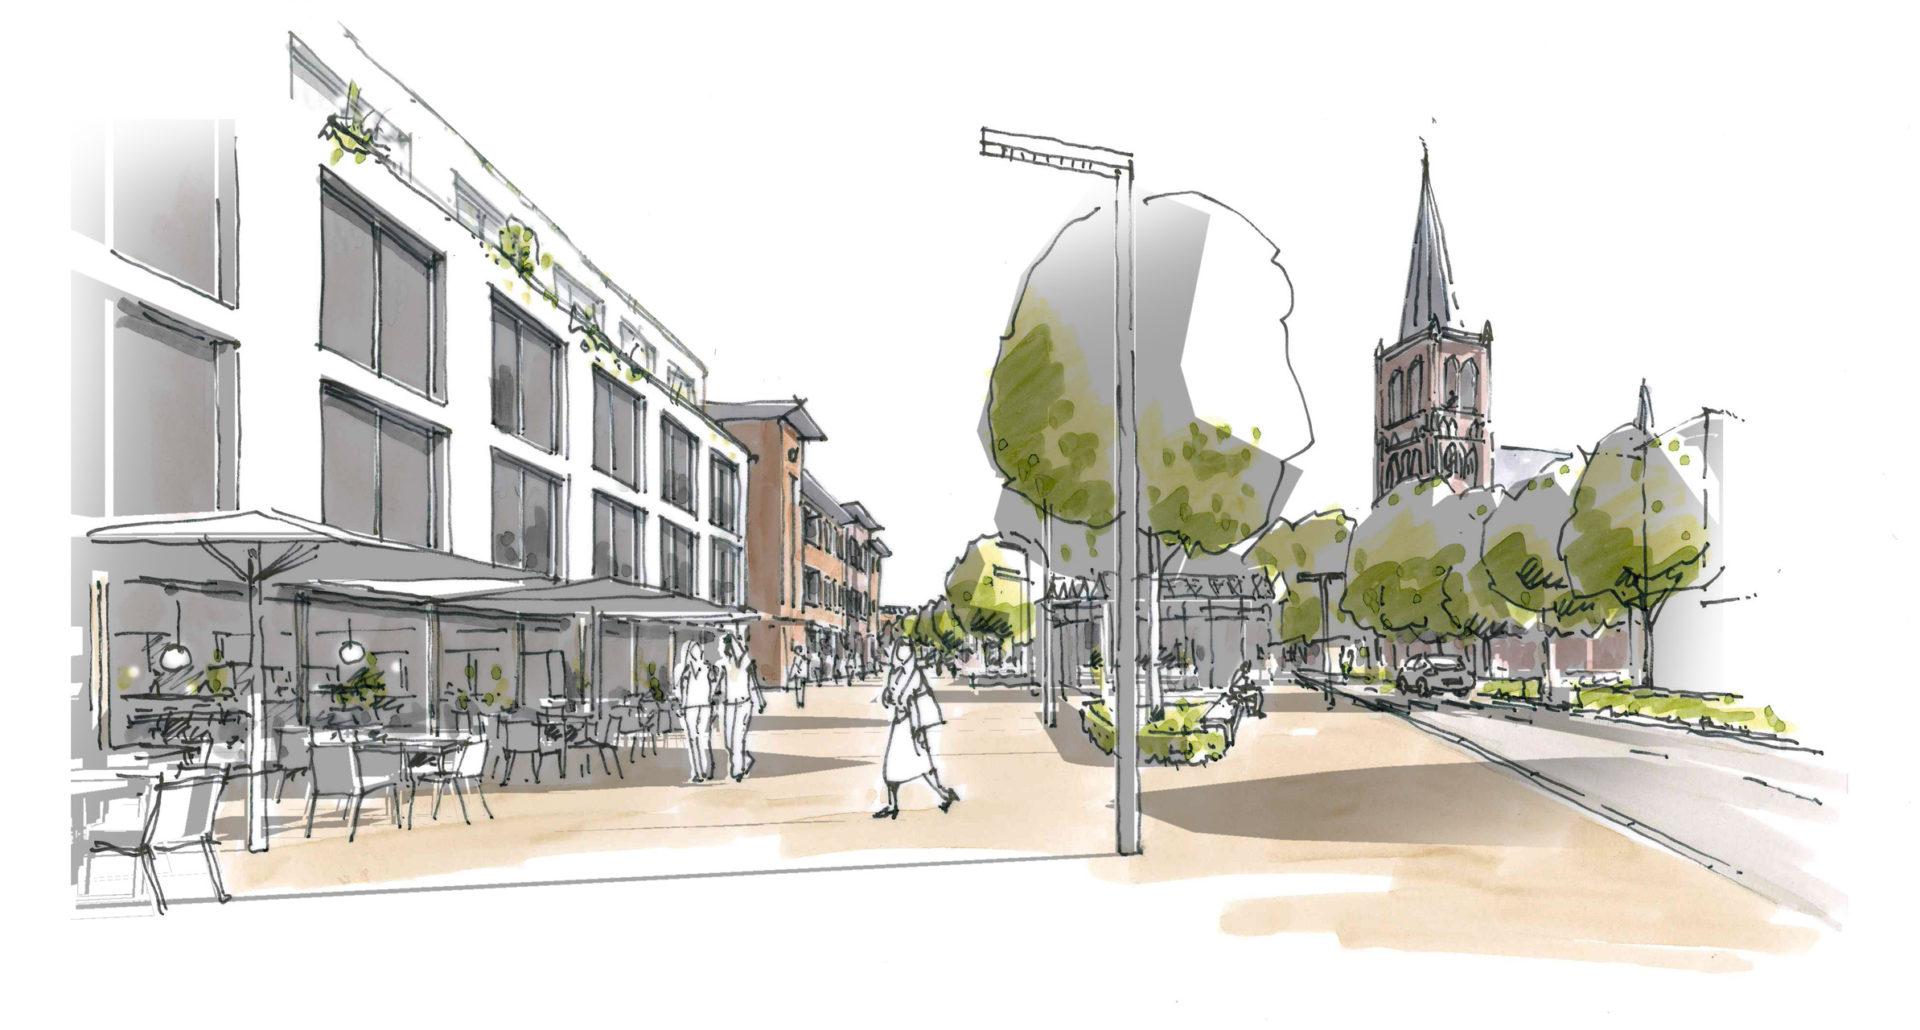 JYB architecten dorpsplein Mierlo Hout-02